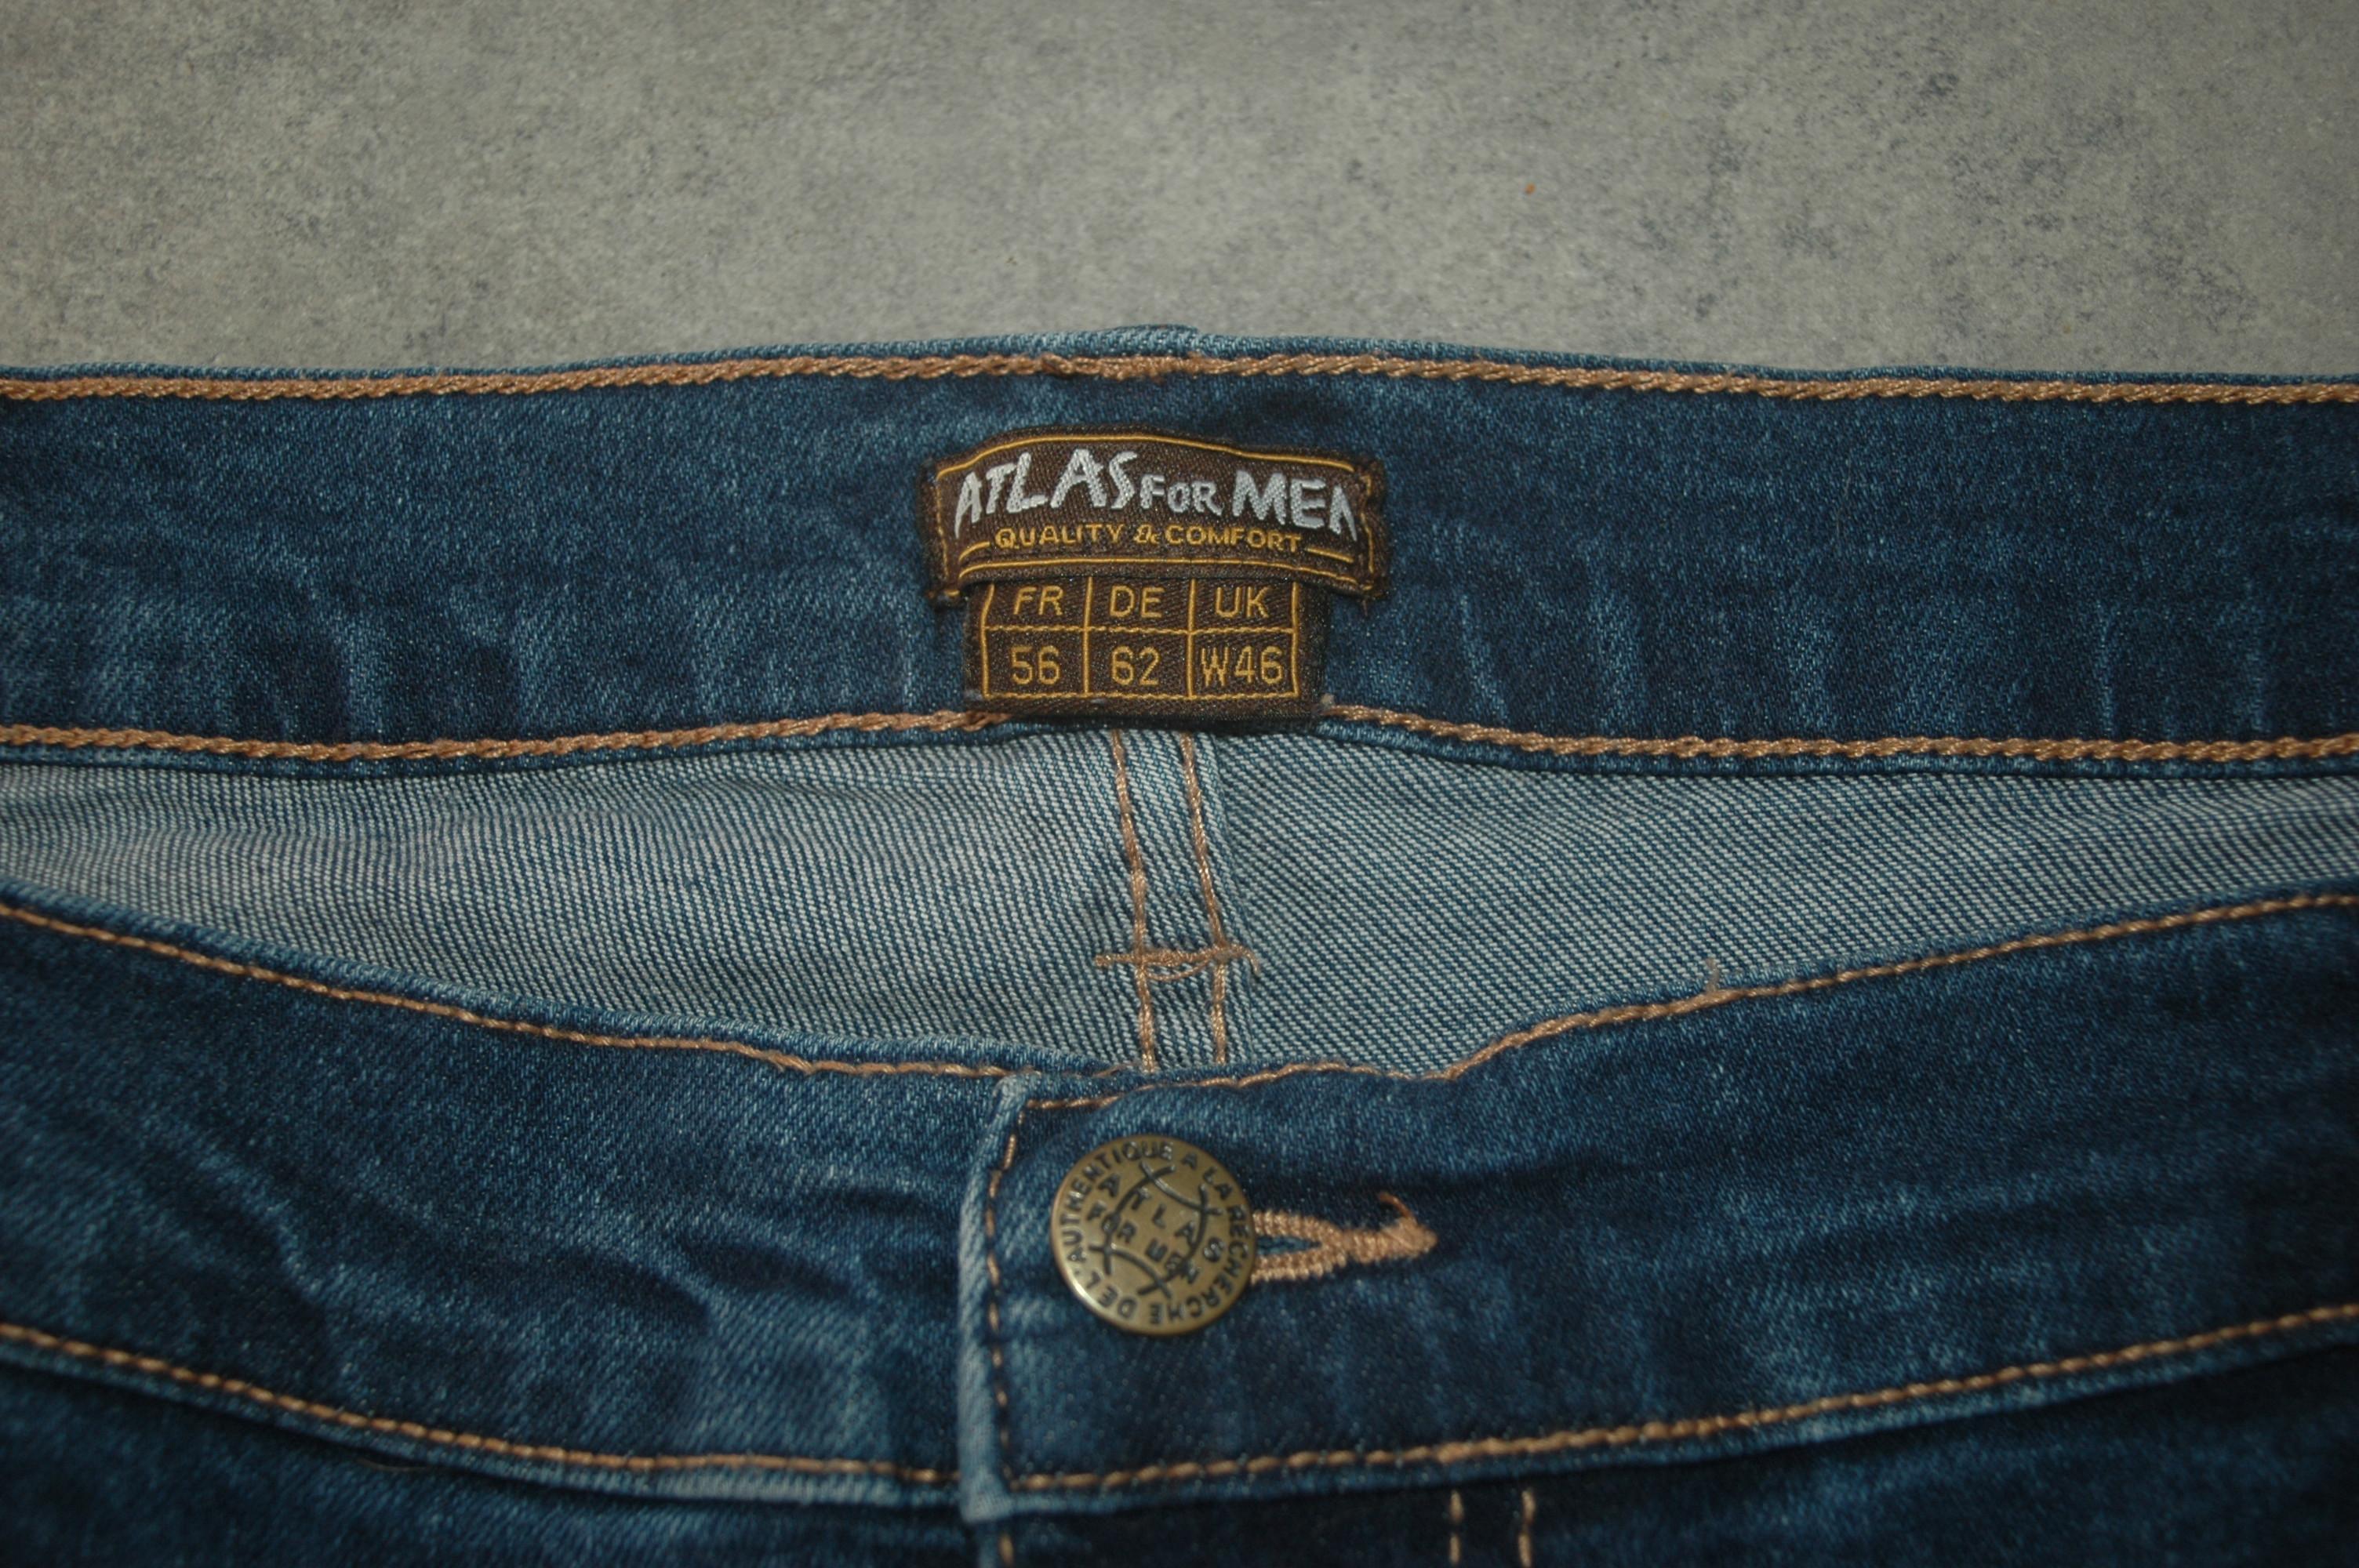 troc de troc jean homme taille 56 image 1